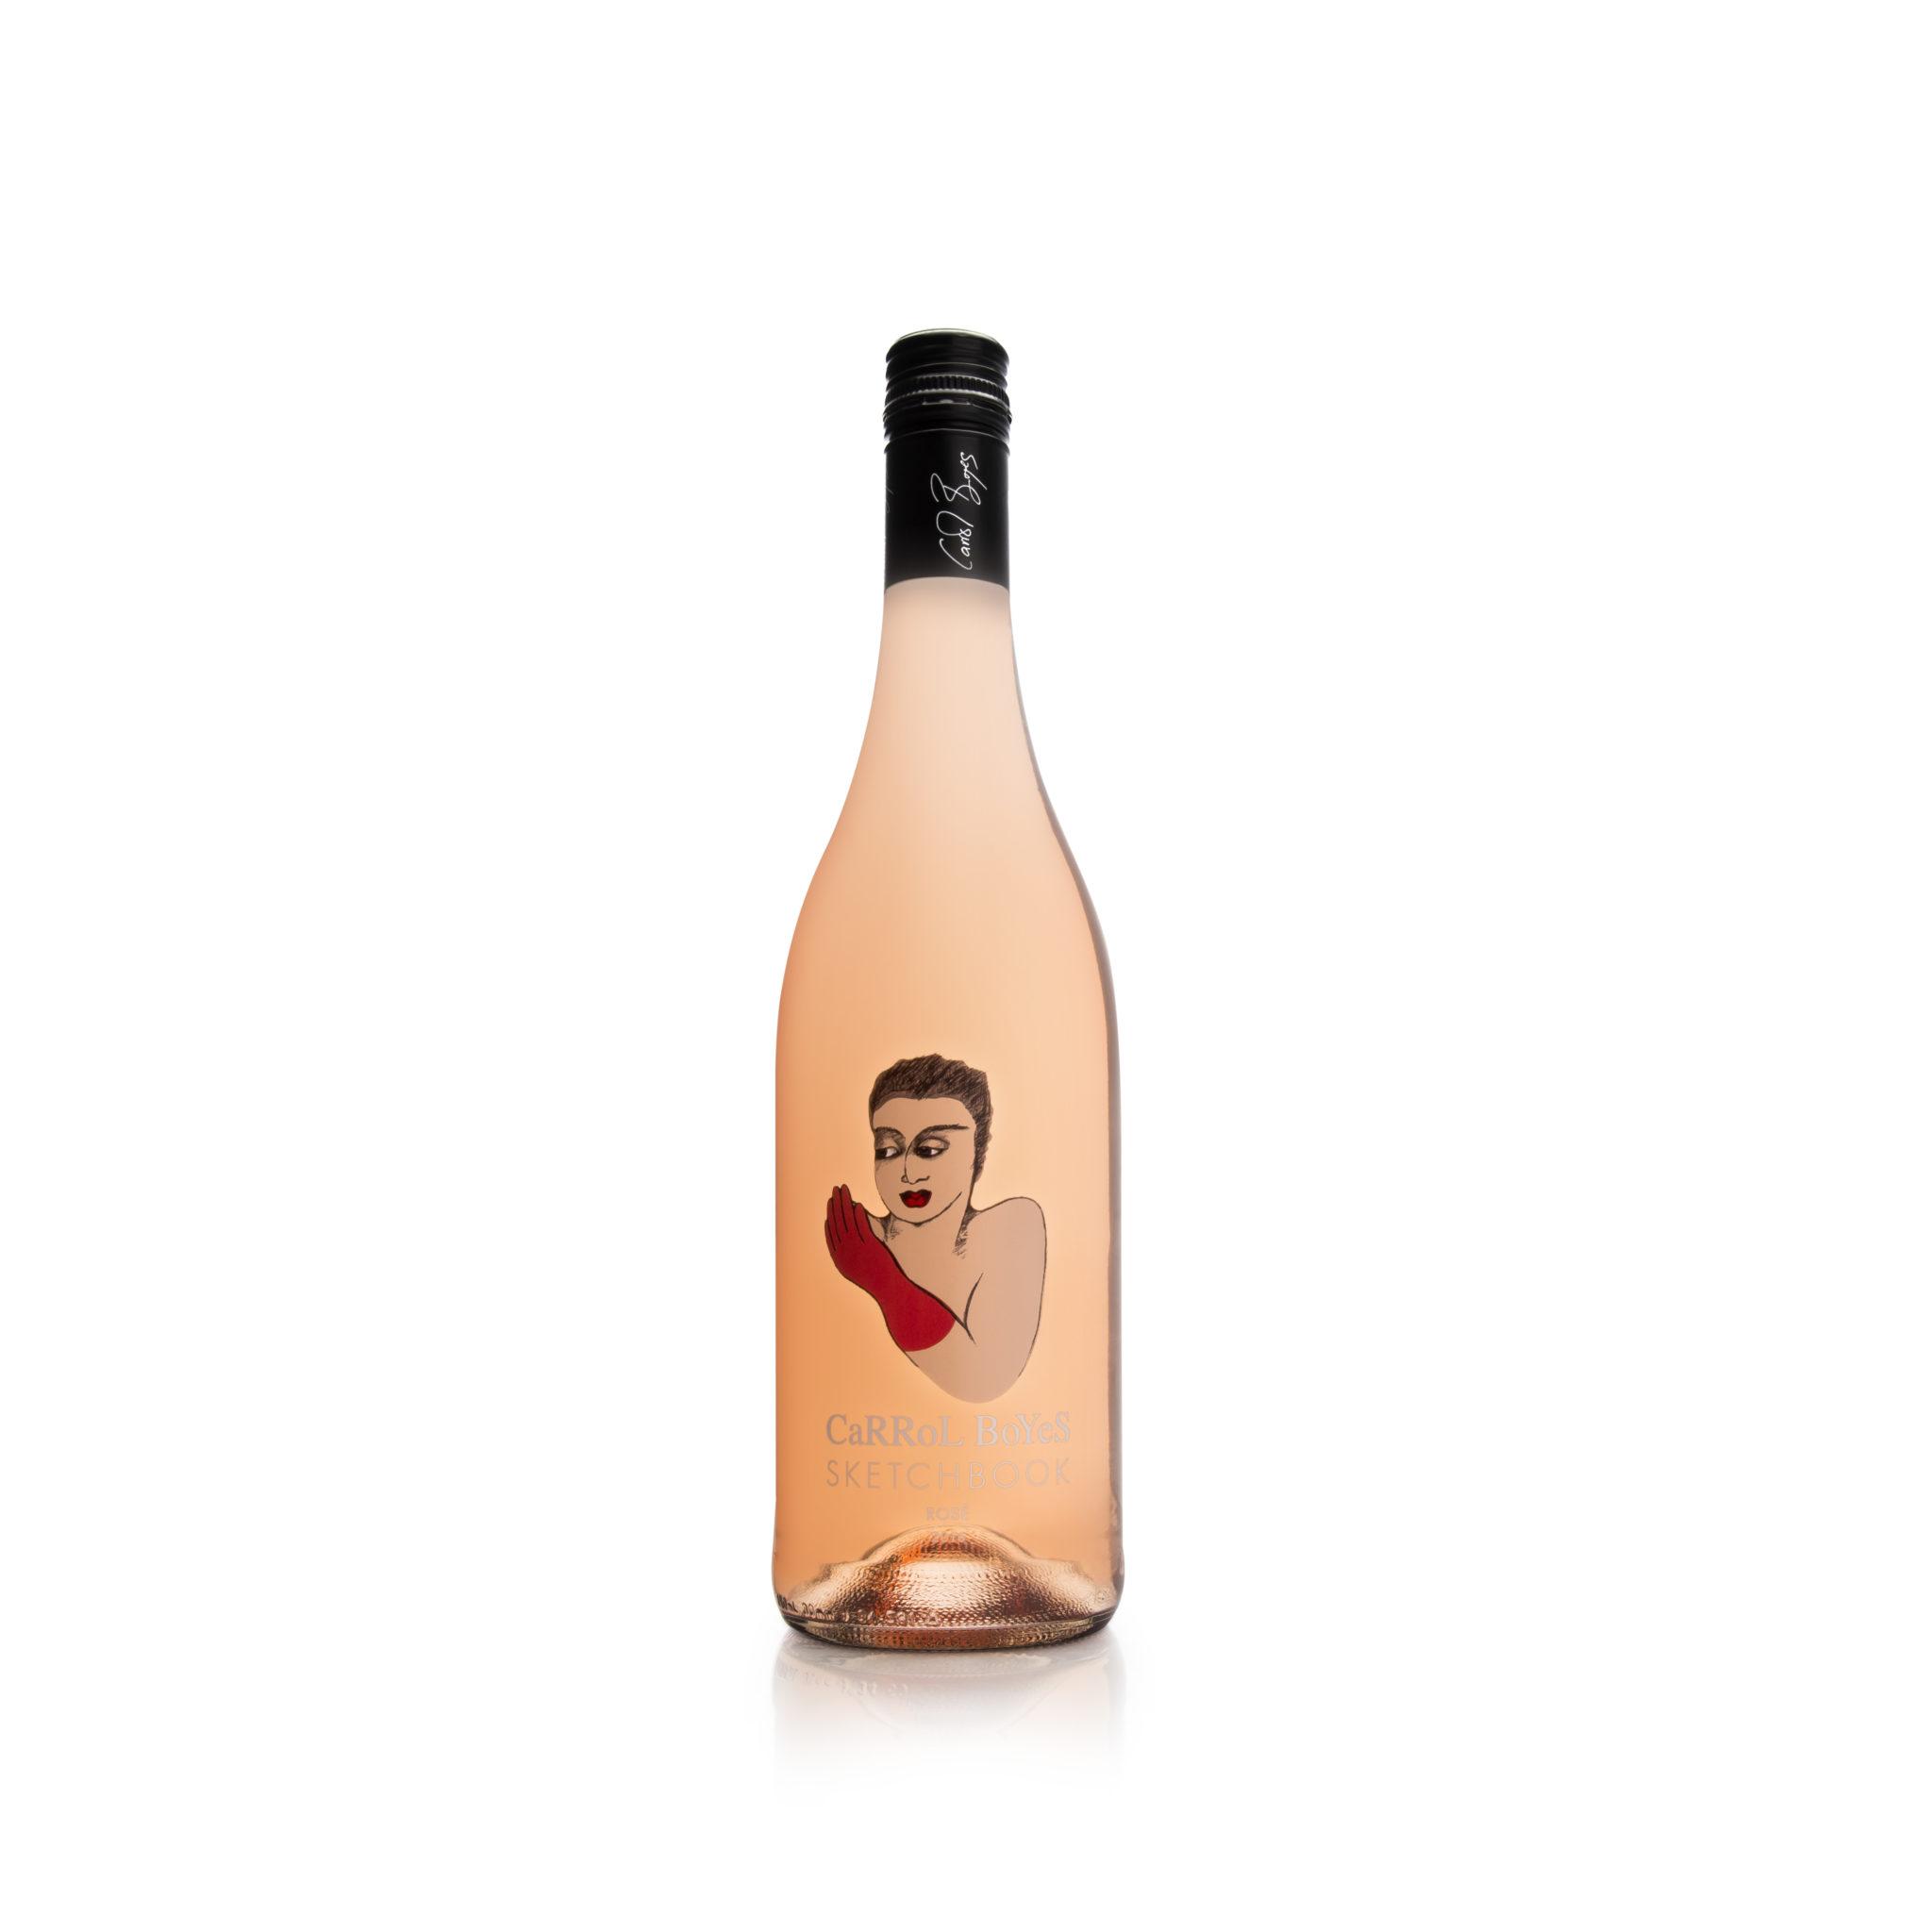 Carrol Boyes Wines Releases Its 2016 Sketchbook Rosé photo